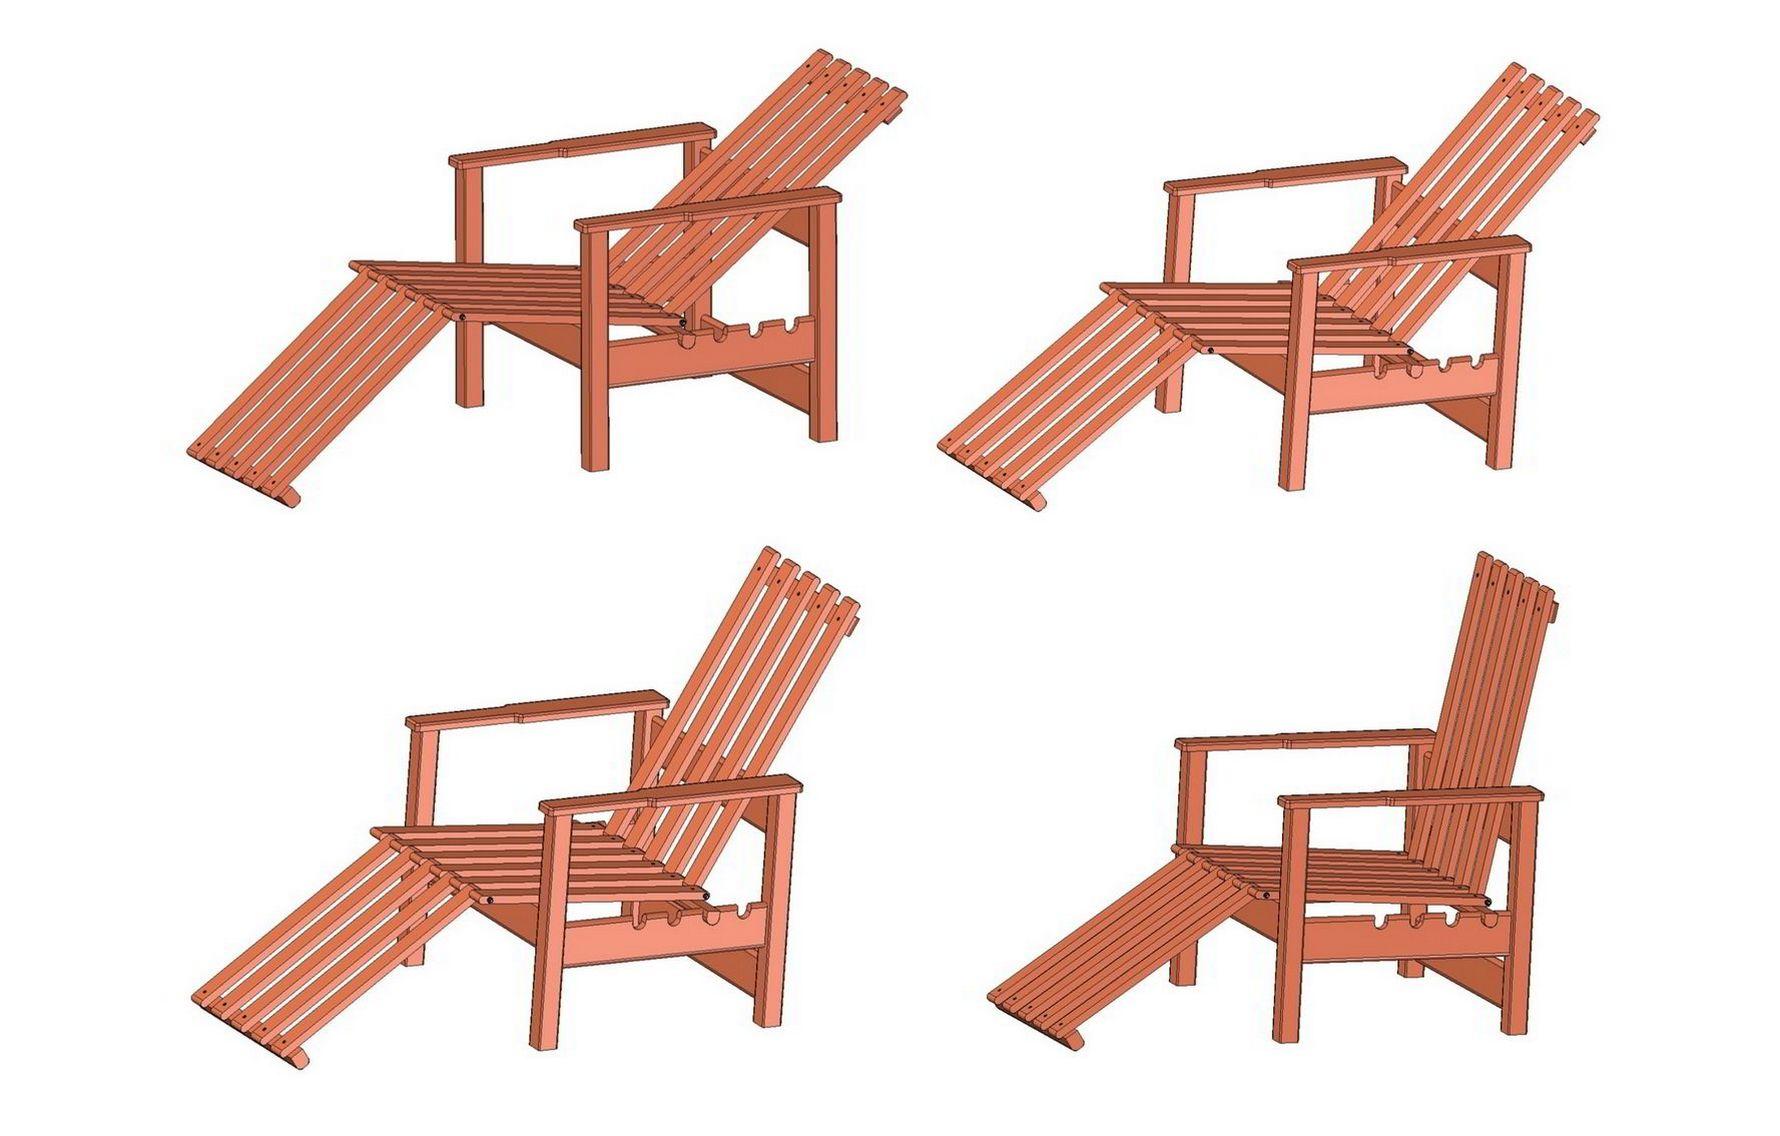 Garden adjustable wooden chair plan - Positions